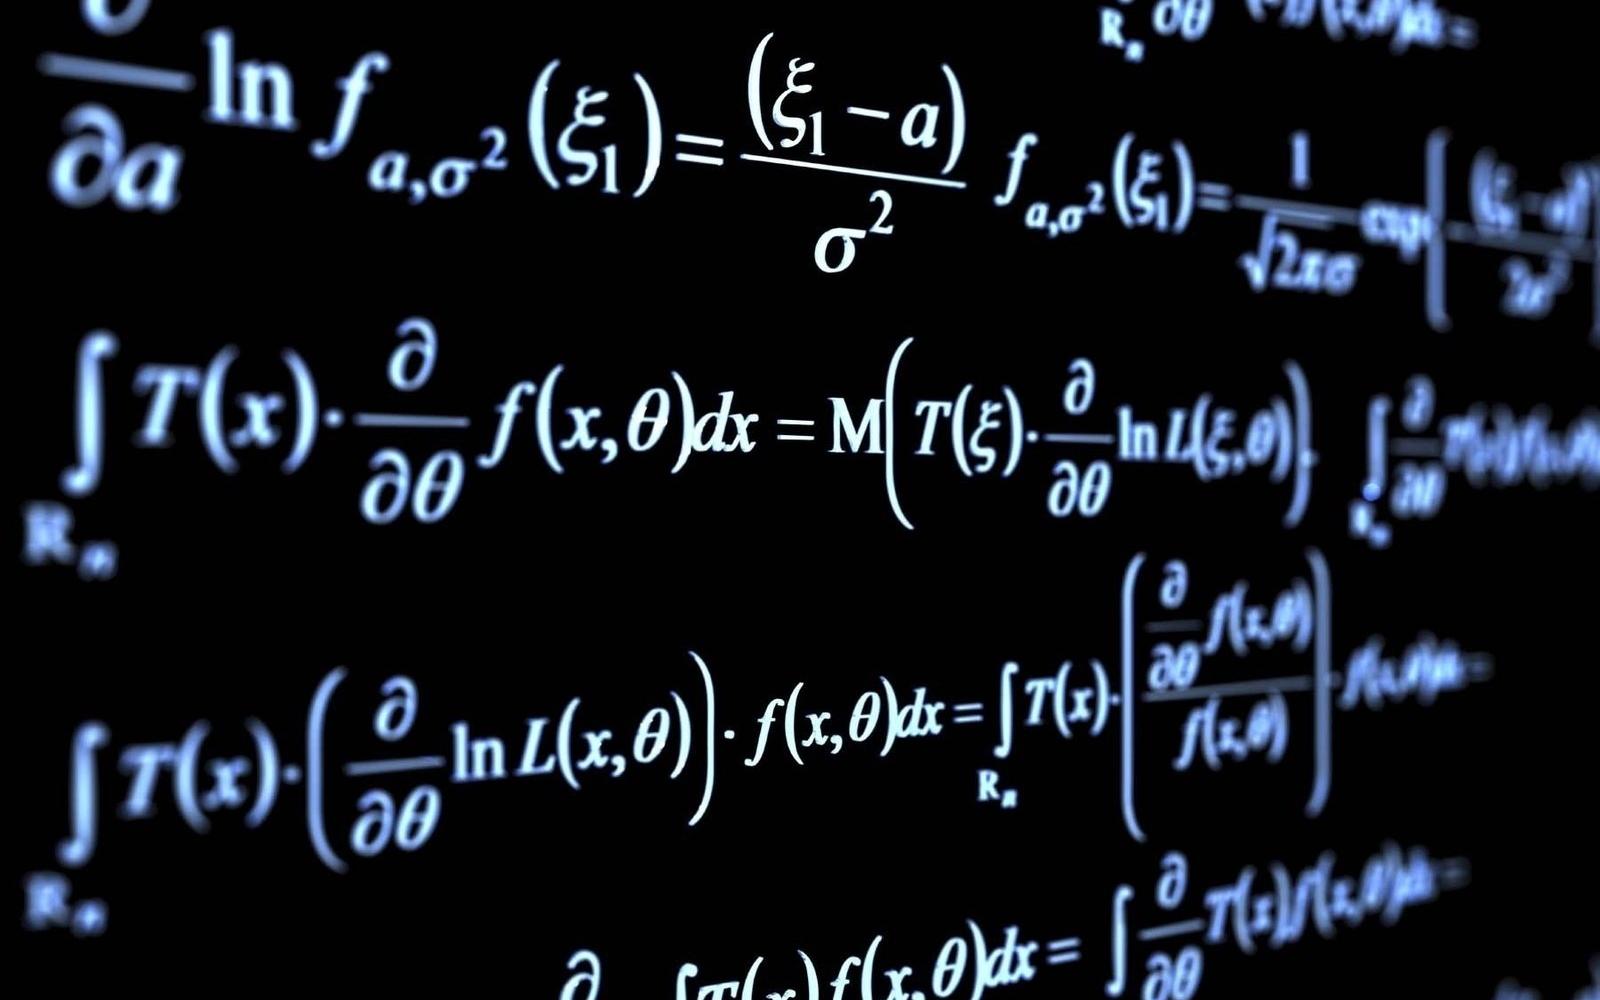 matematica_e_informatica_per_farmacia_1542015468.png